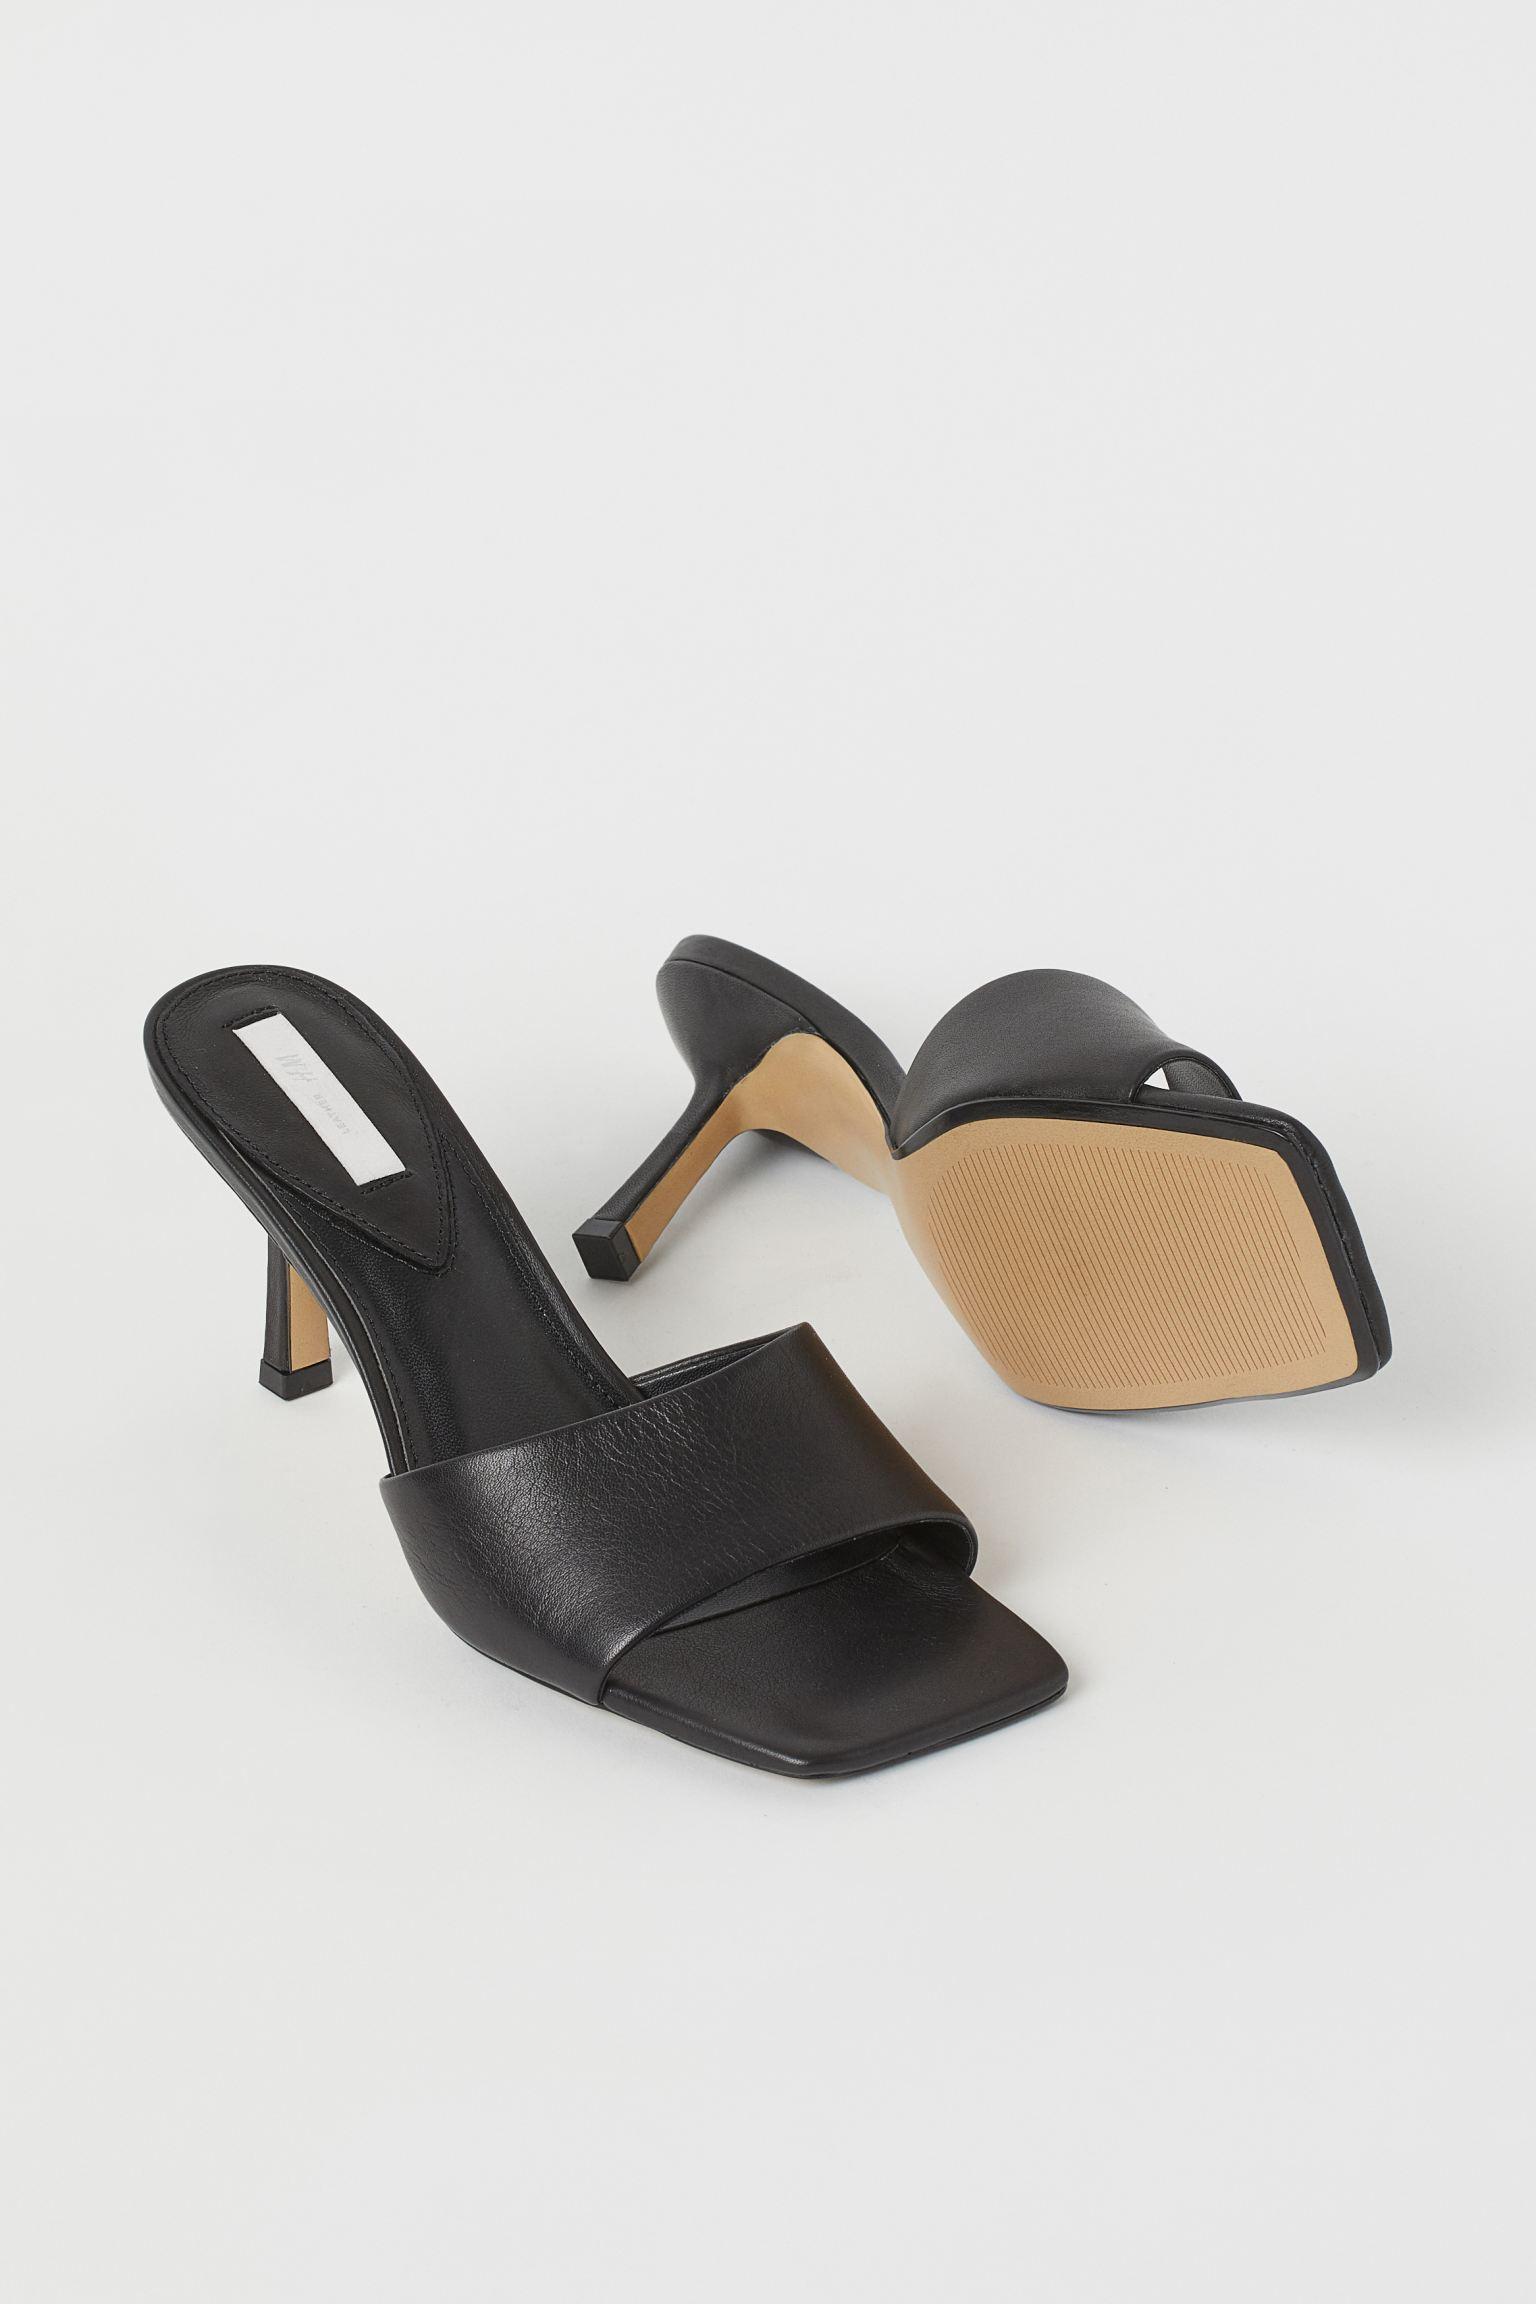 Sandalias mule de piel